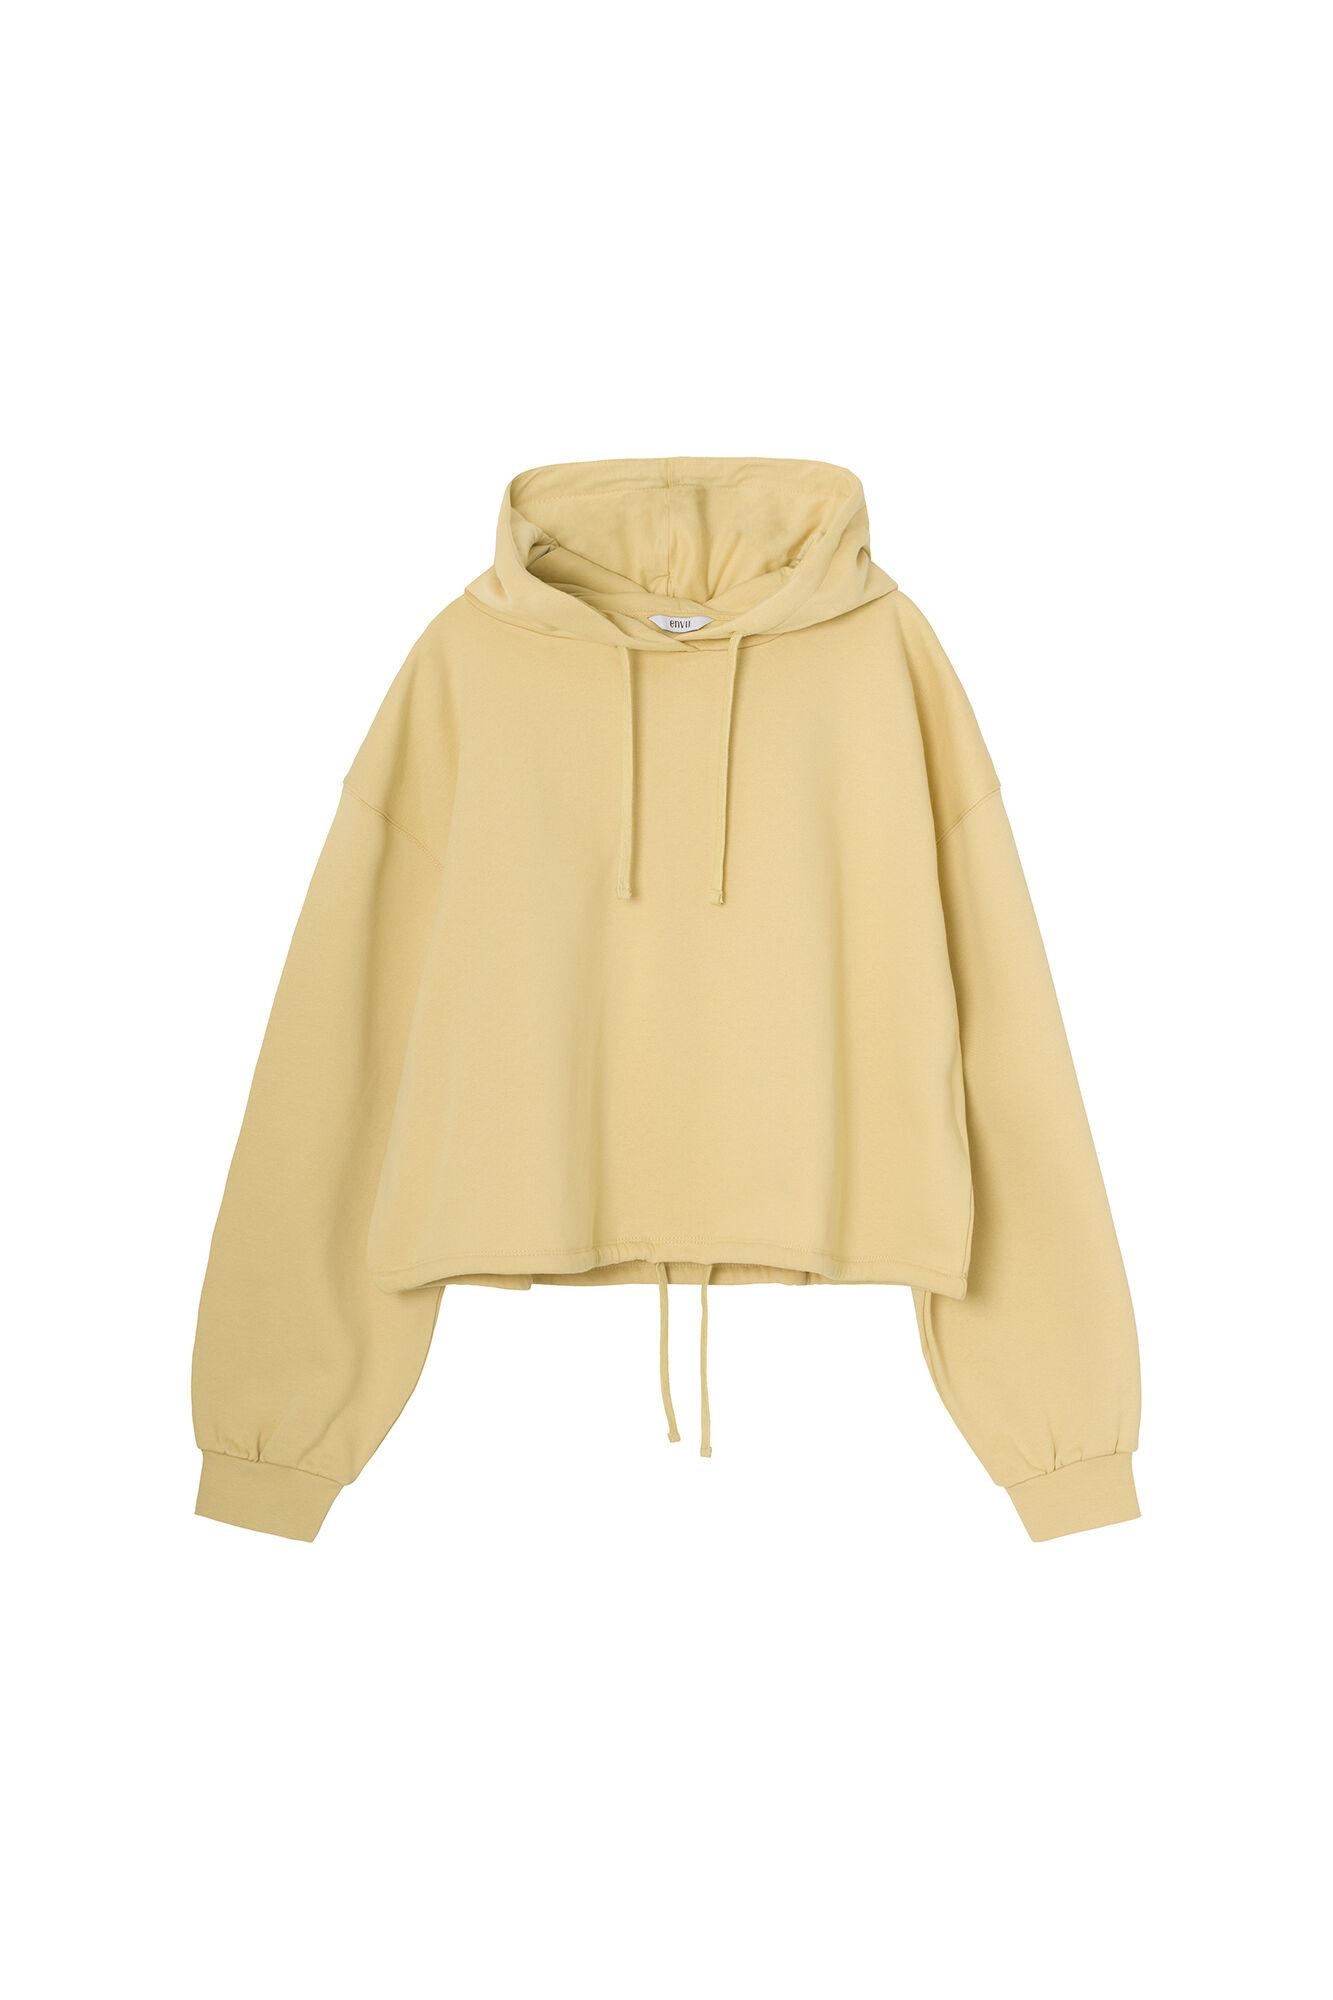 Envii Monroe LS sweatshirt, straw, x-large